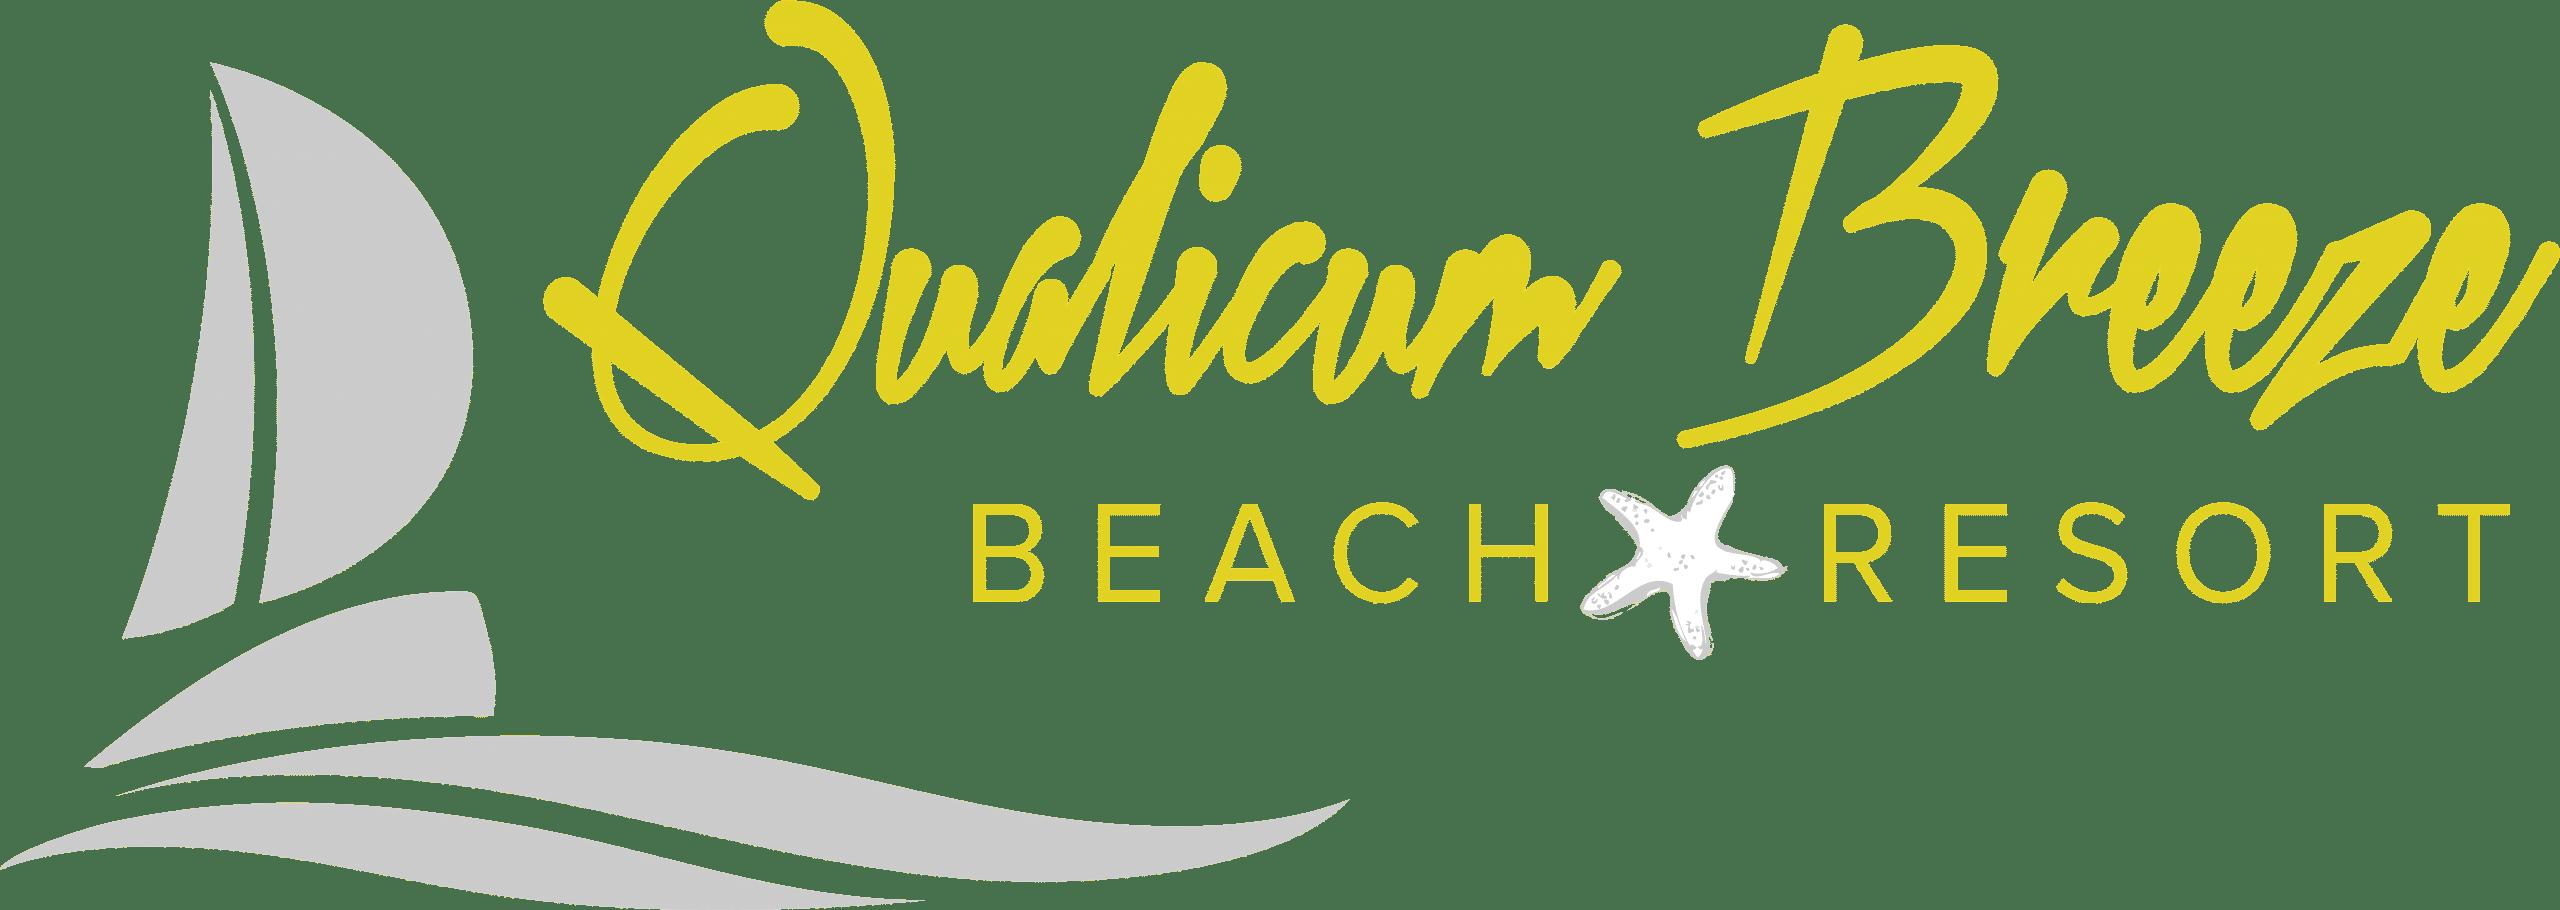 Qualicum Breeze Resort